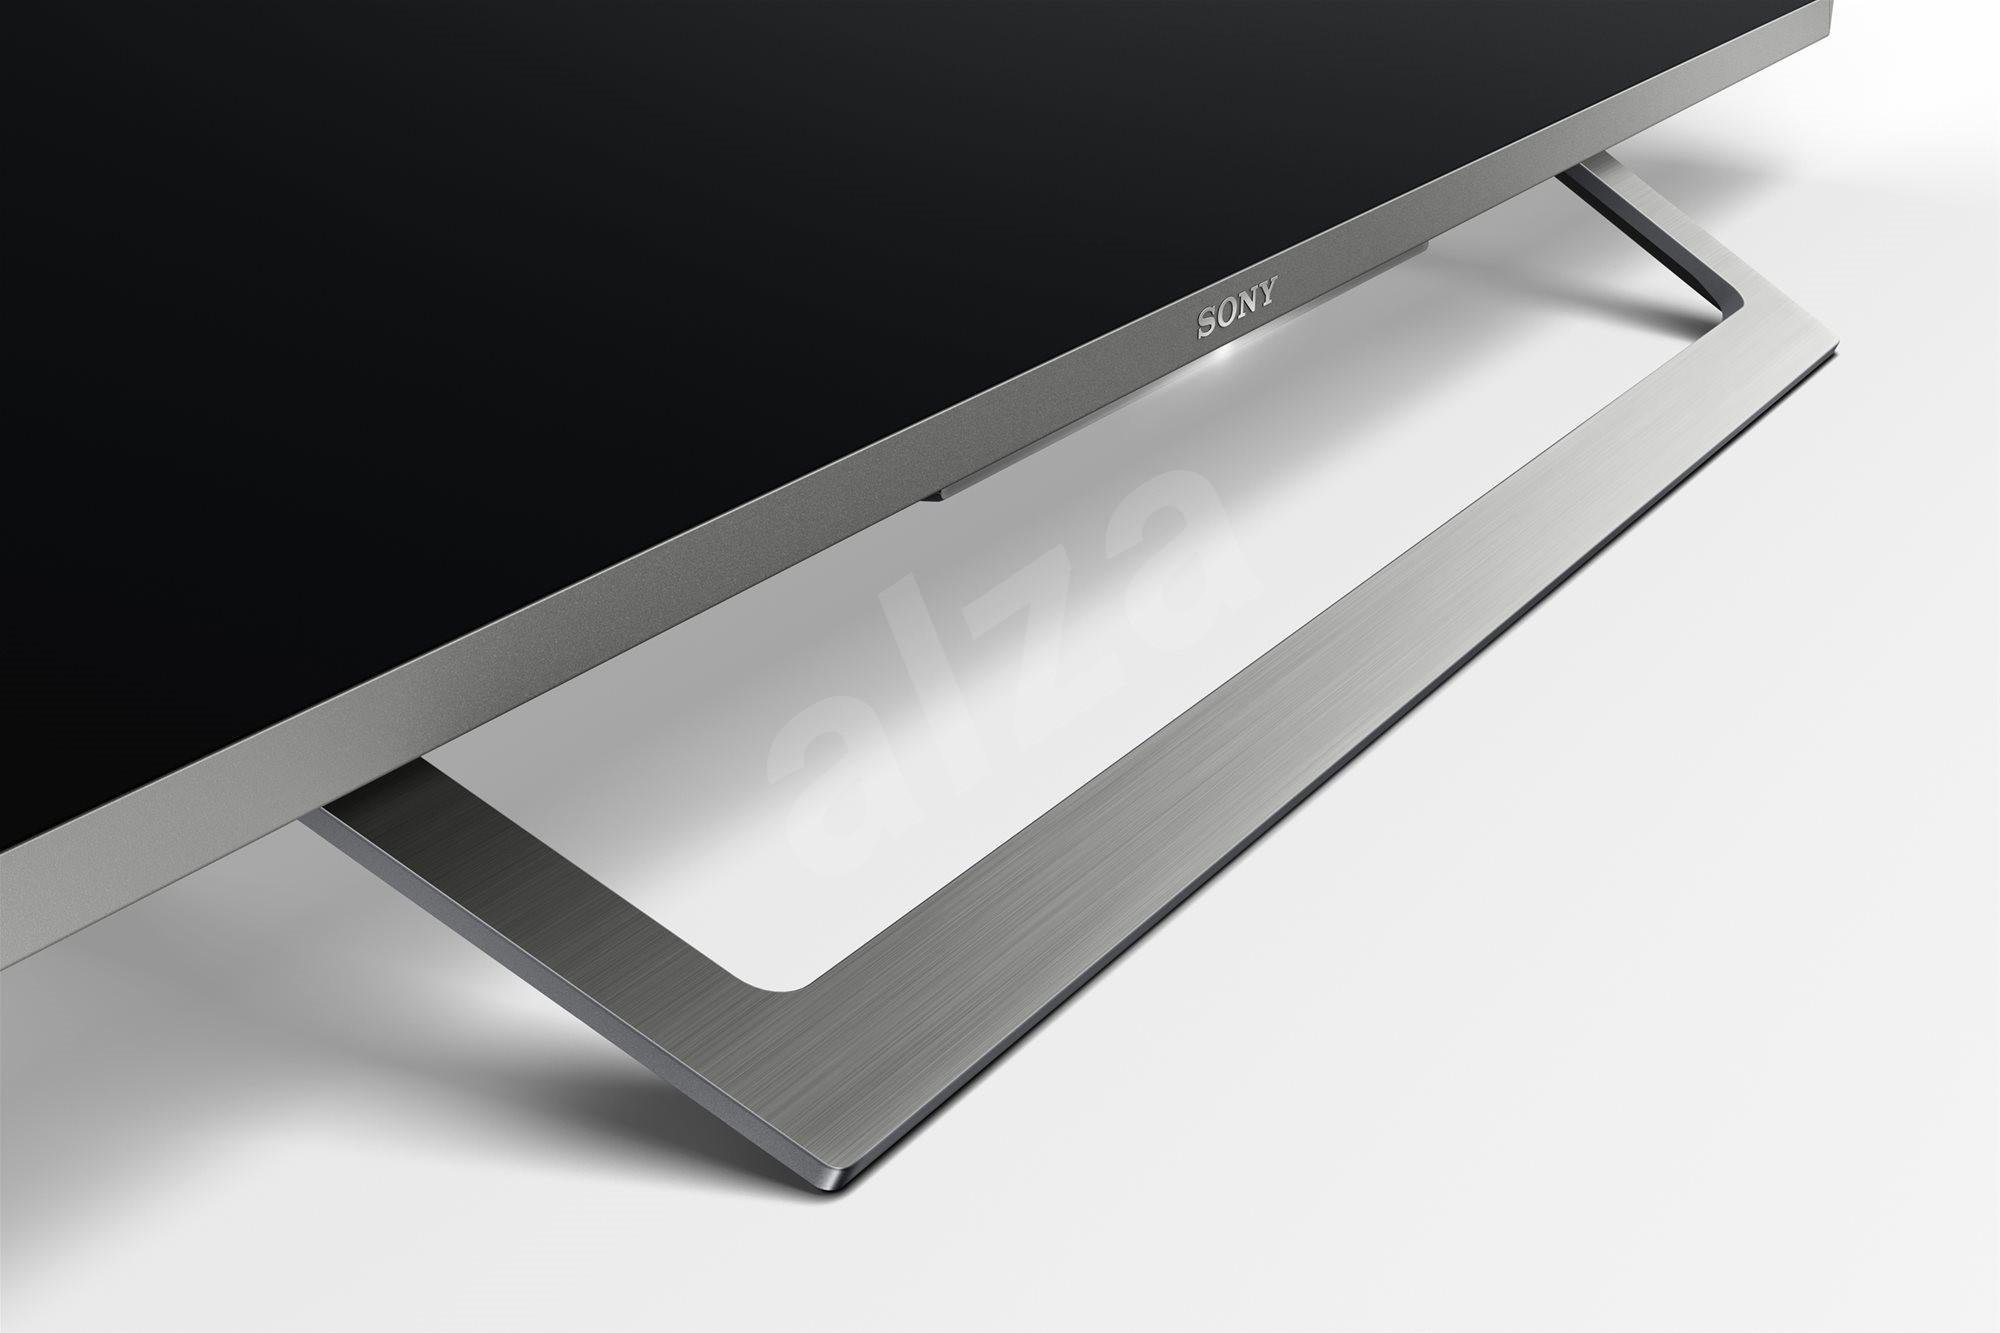 32 sony bravia kdl 32wd757 fernseher. Black Bedroom Furniture Sets. Home Design Ideas